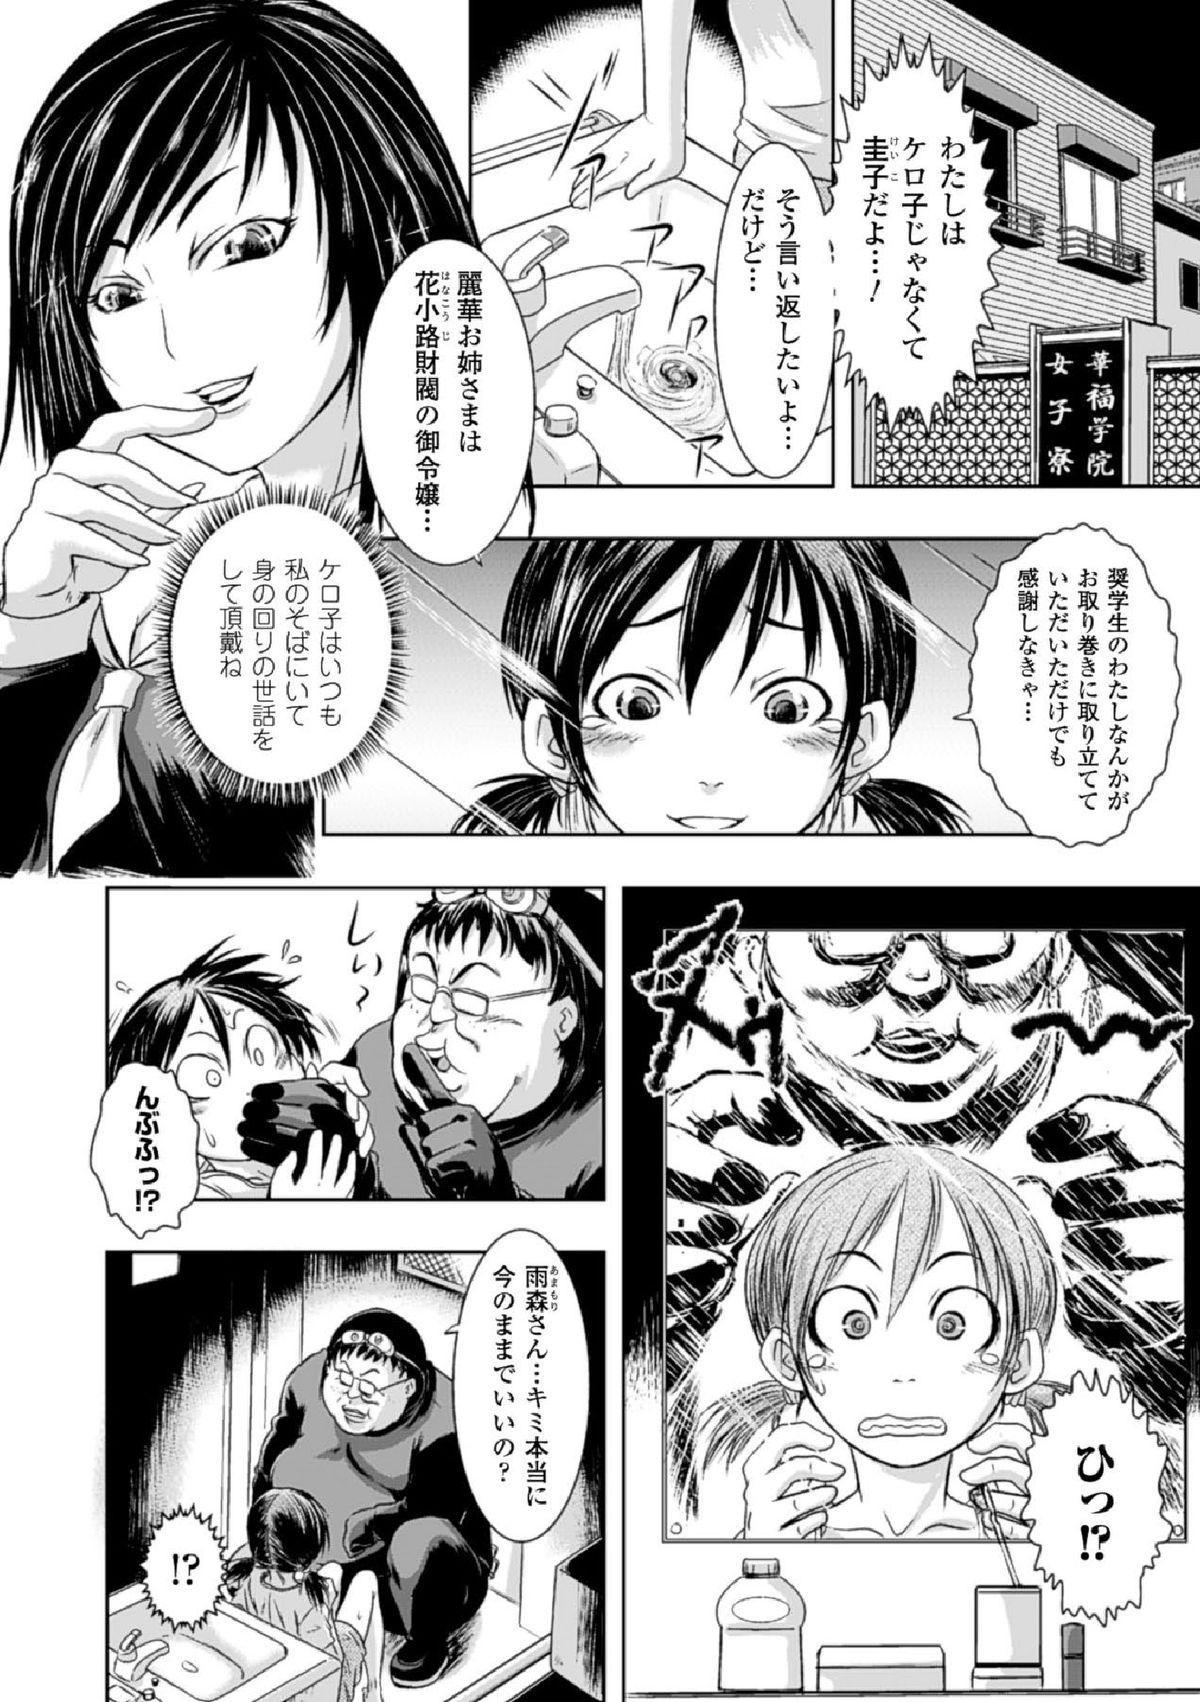 Haiboku Heroine Kaizou Choukyou Inferno 129